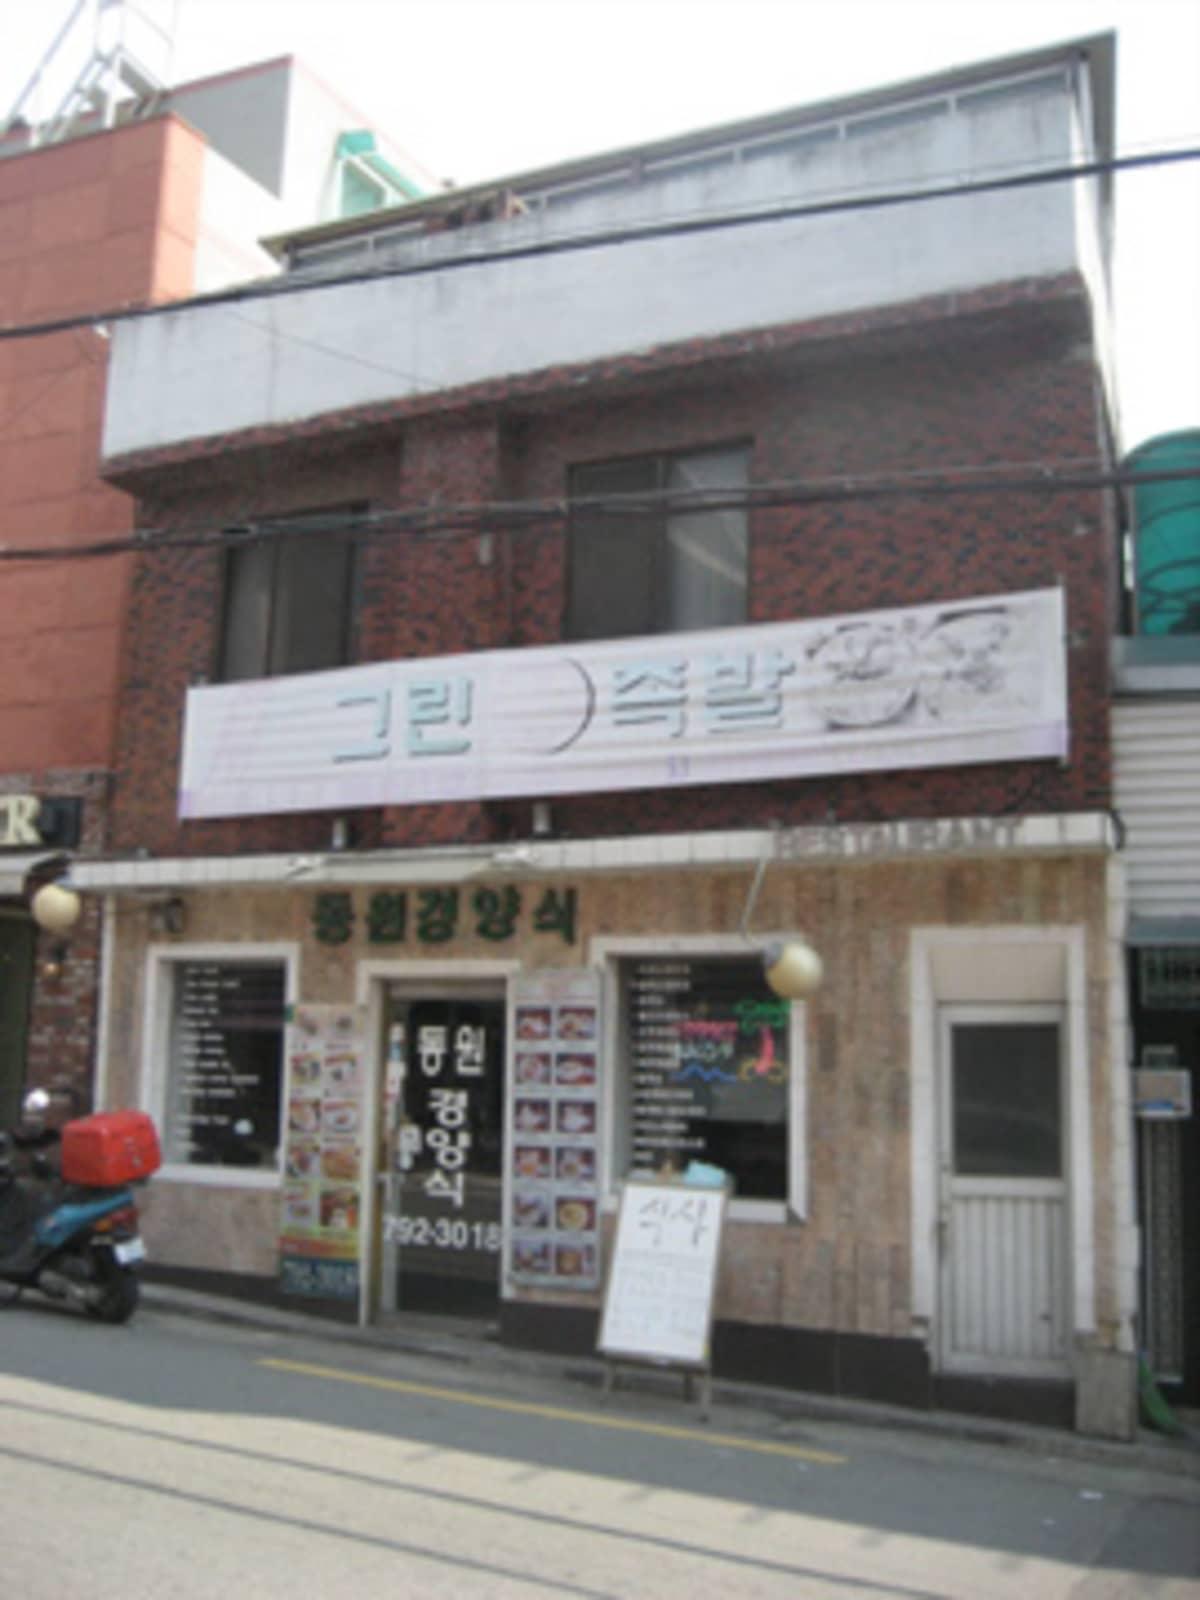 Dong Won -ravintola Soulin Hae Ban Chongin kaupunginosassa.